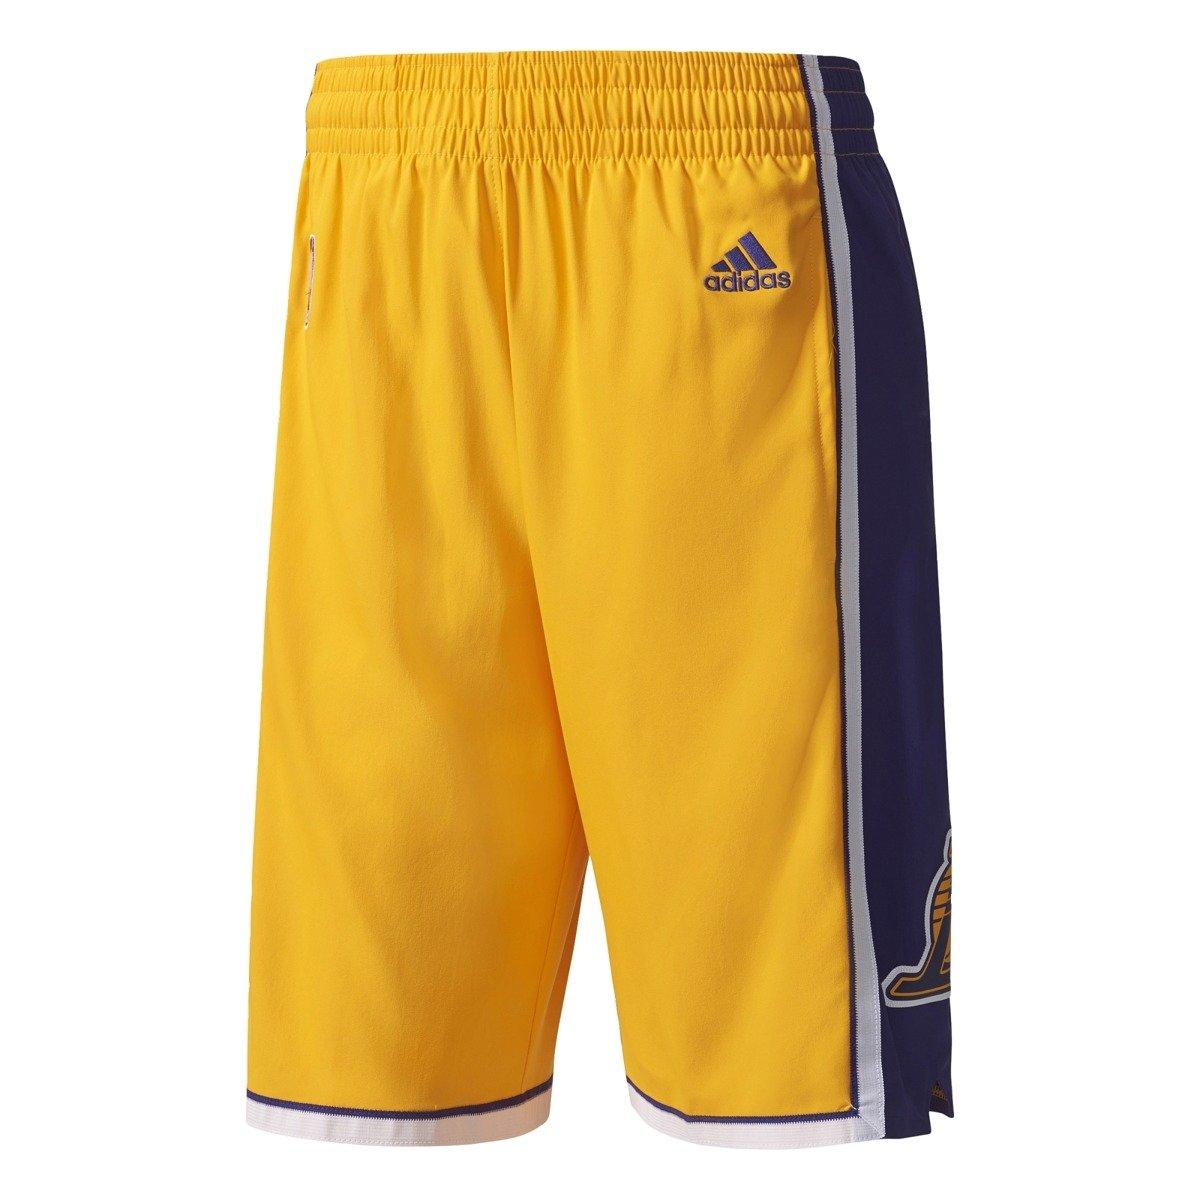 Spodenki koszykarskie adidas Los Angeles Lakers NBA Swingman